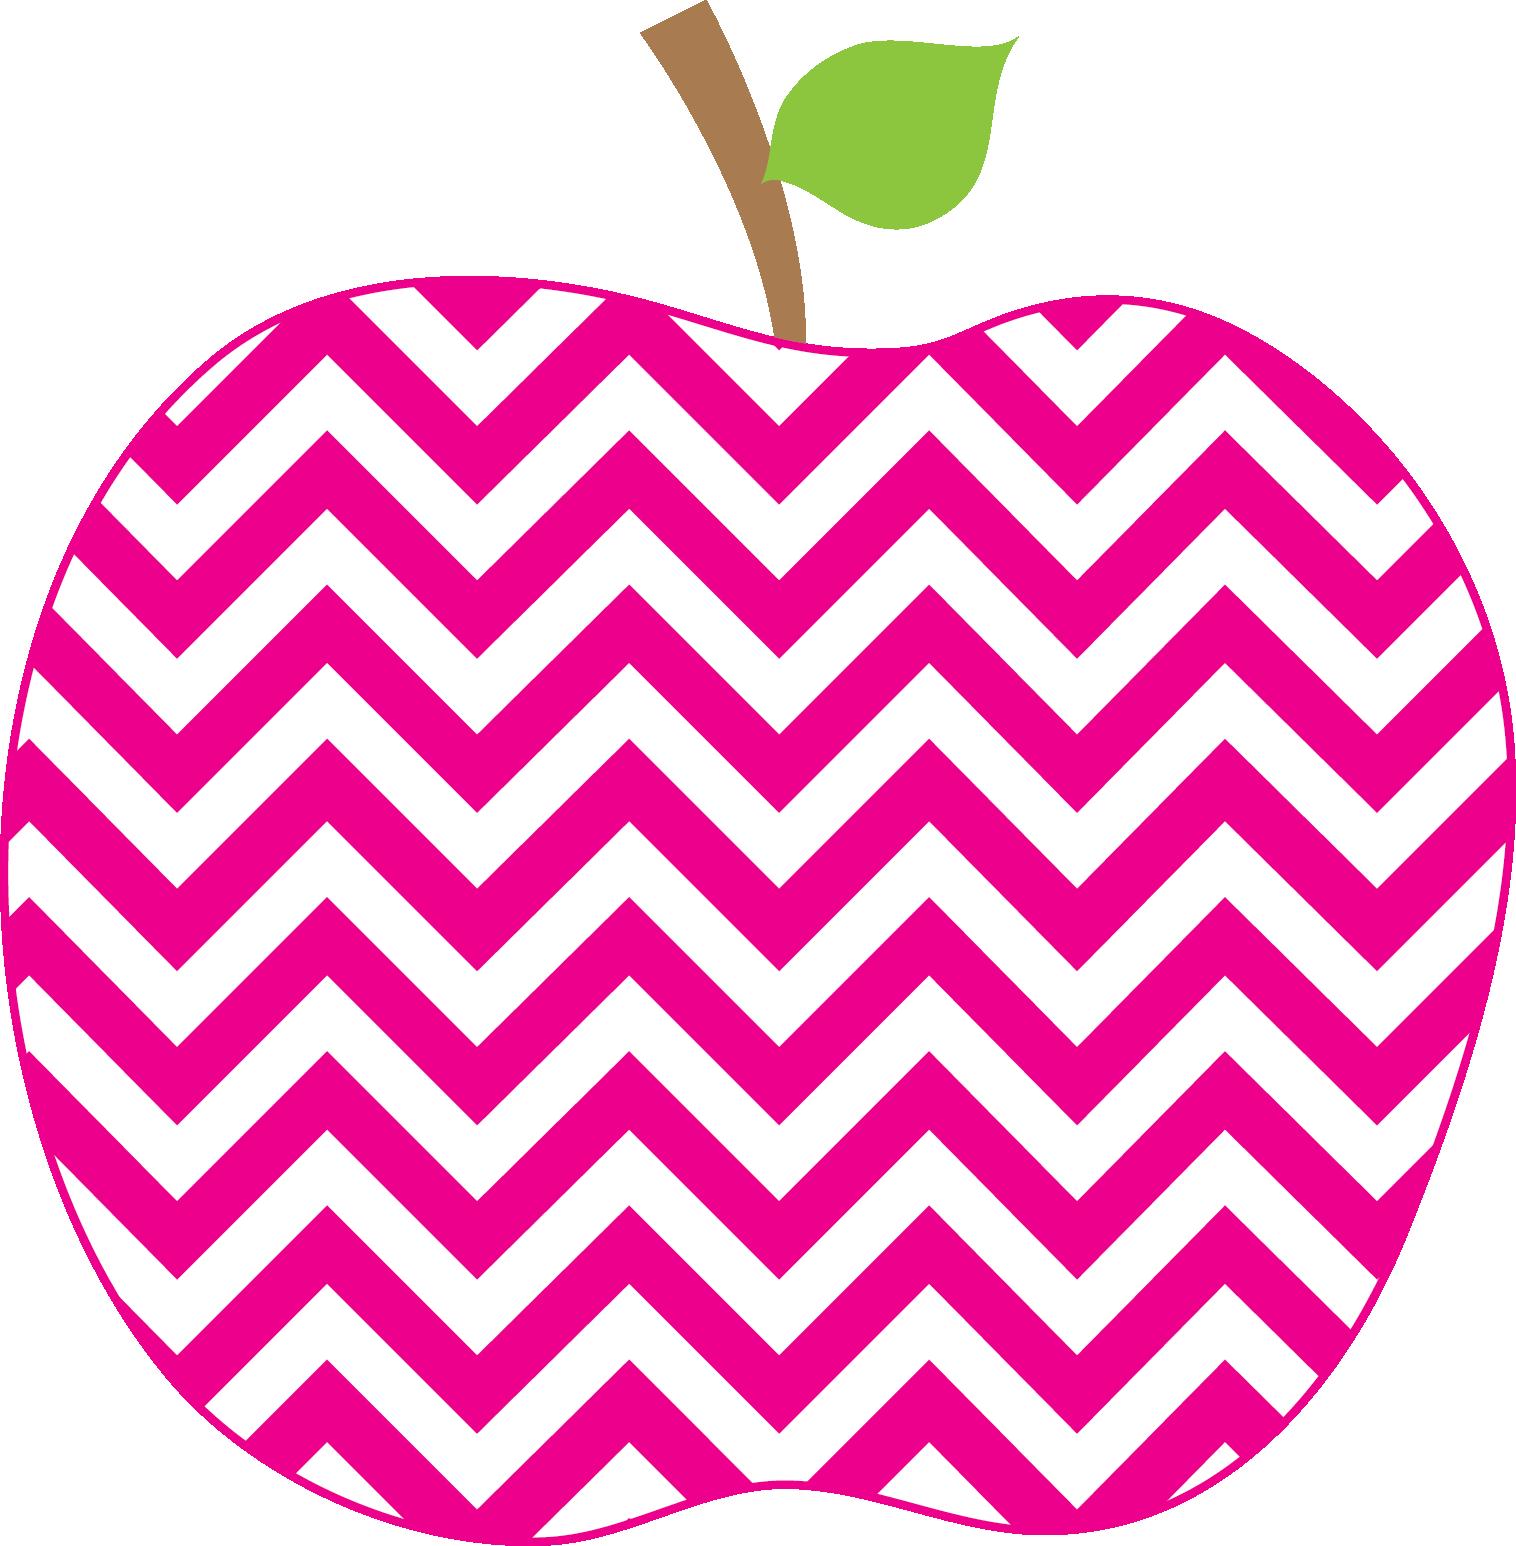 Clipart cross teacher. Chevron apple